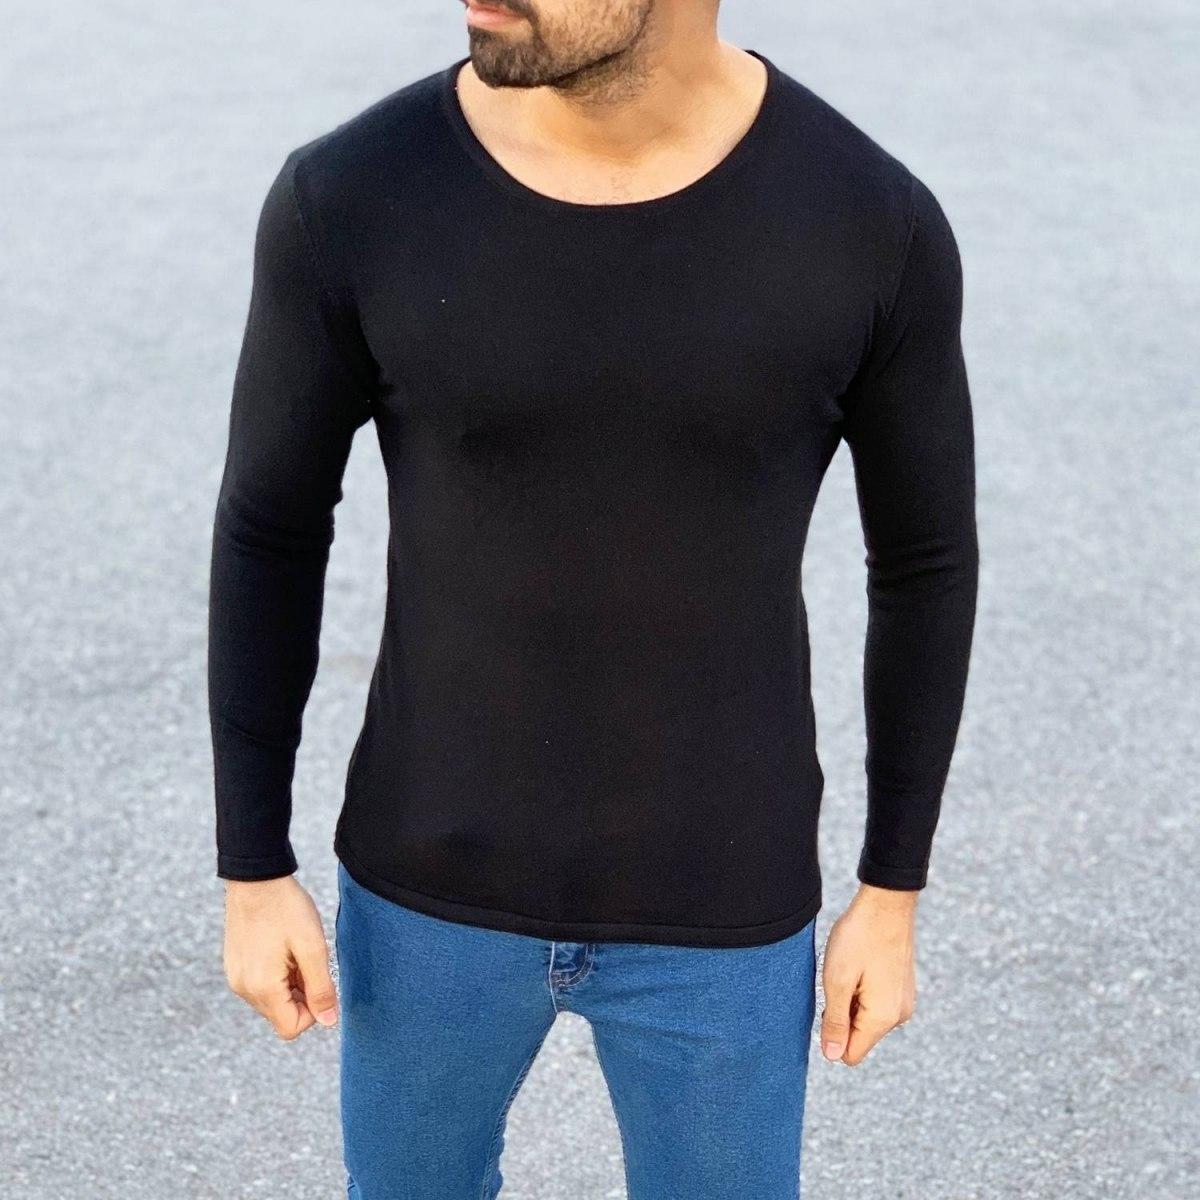 Round-Neck Slim-Fit Sweater in Black Mv Premium Brand - 2